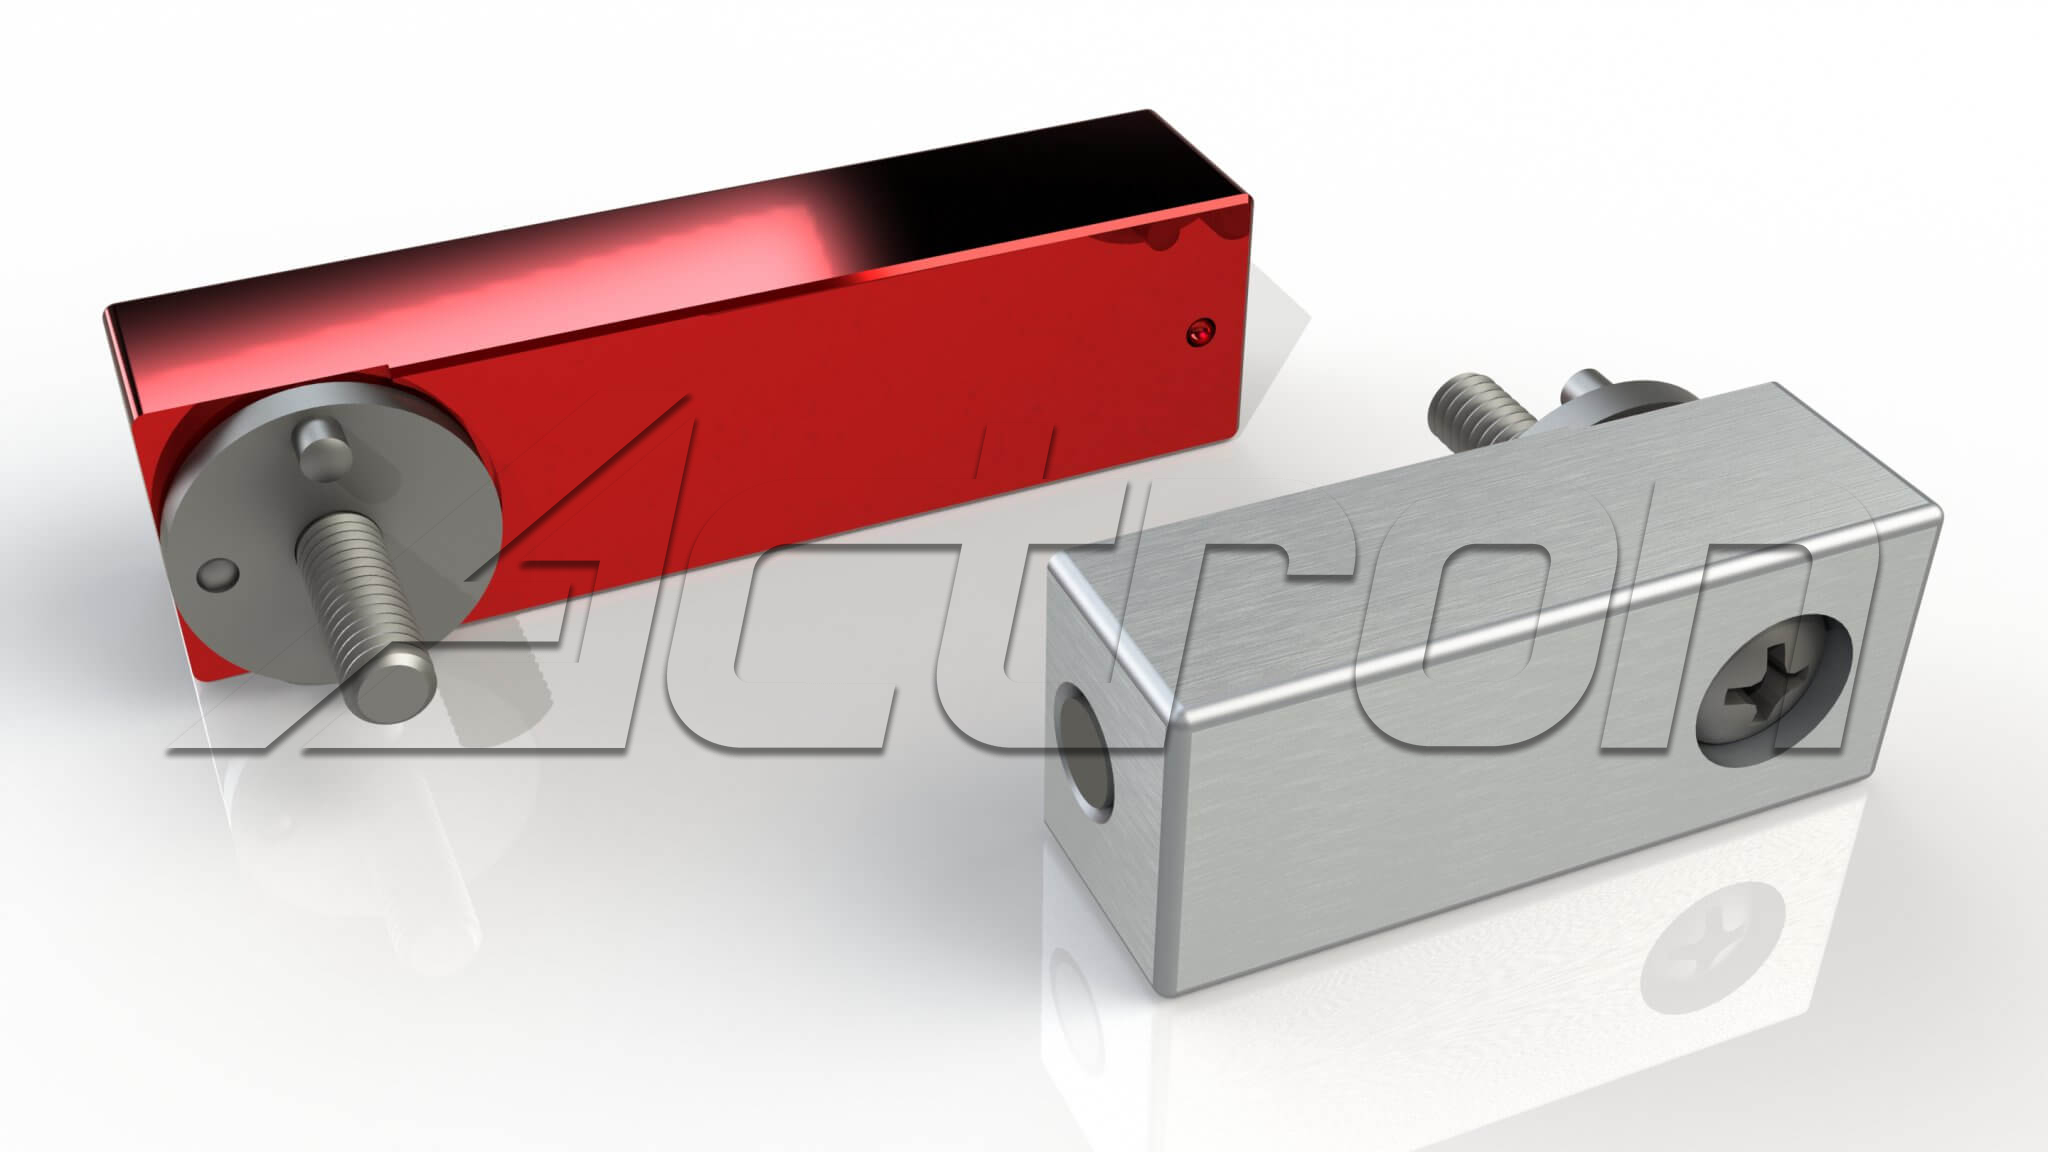 1-4-turn-retainer-4811-a35593.jpg